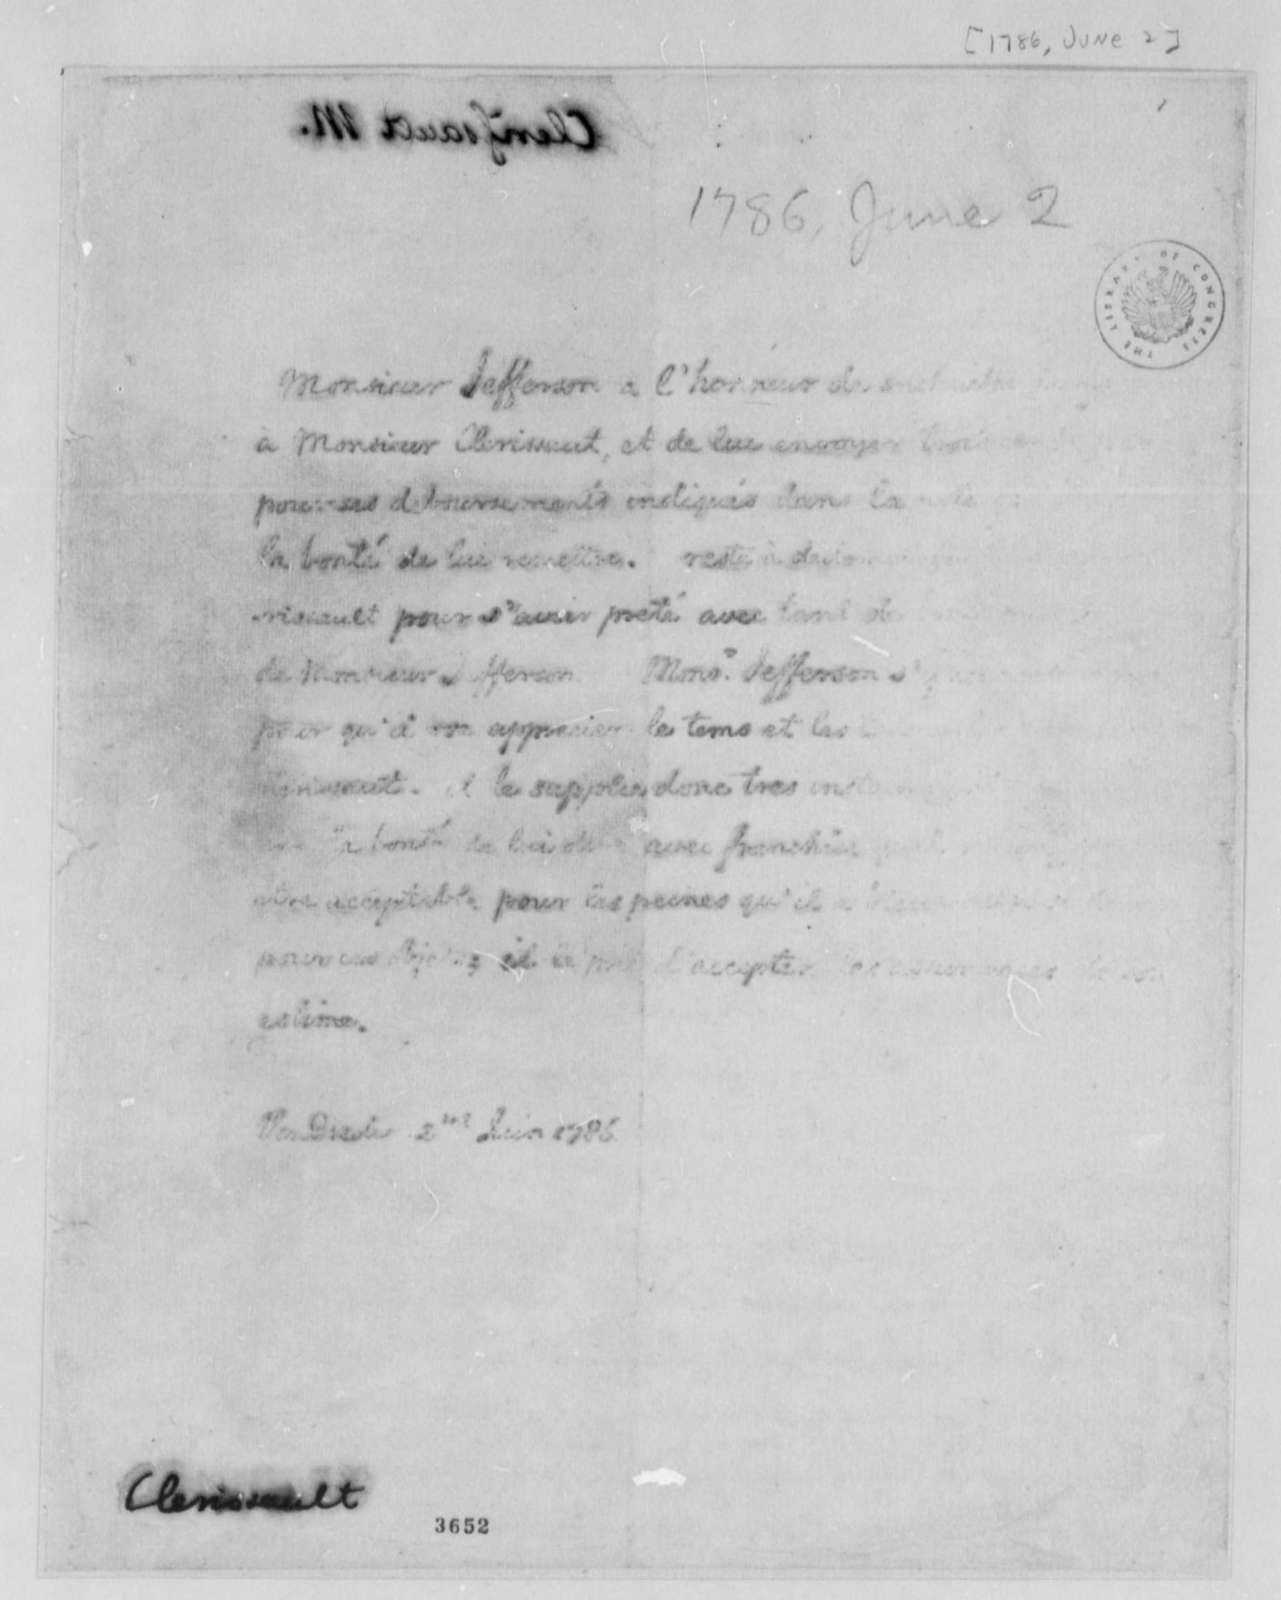 Thomas Jefferson to Charles Clerisseau, June 2, 1786